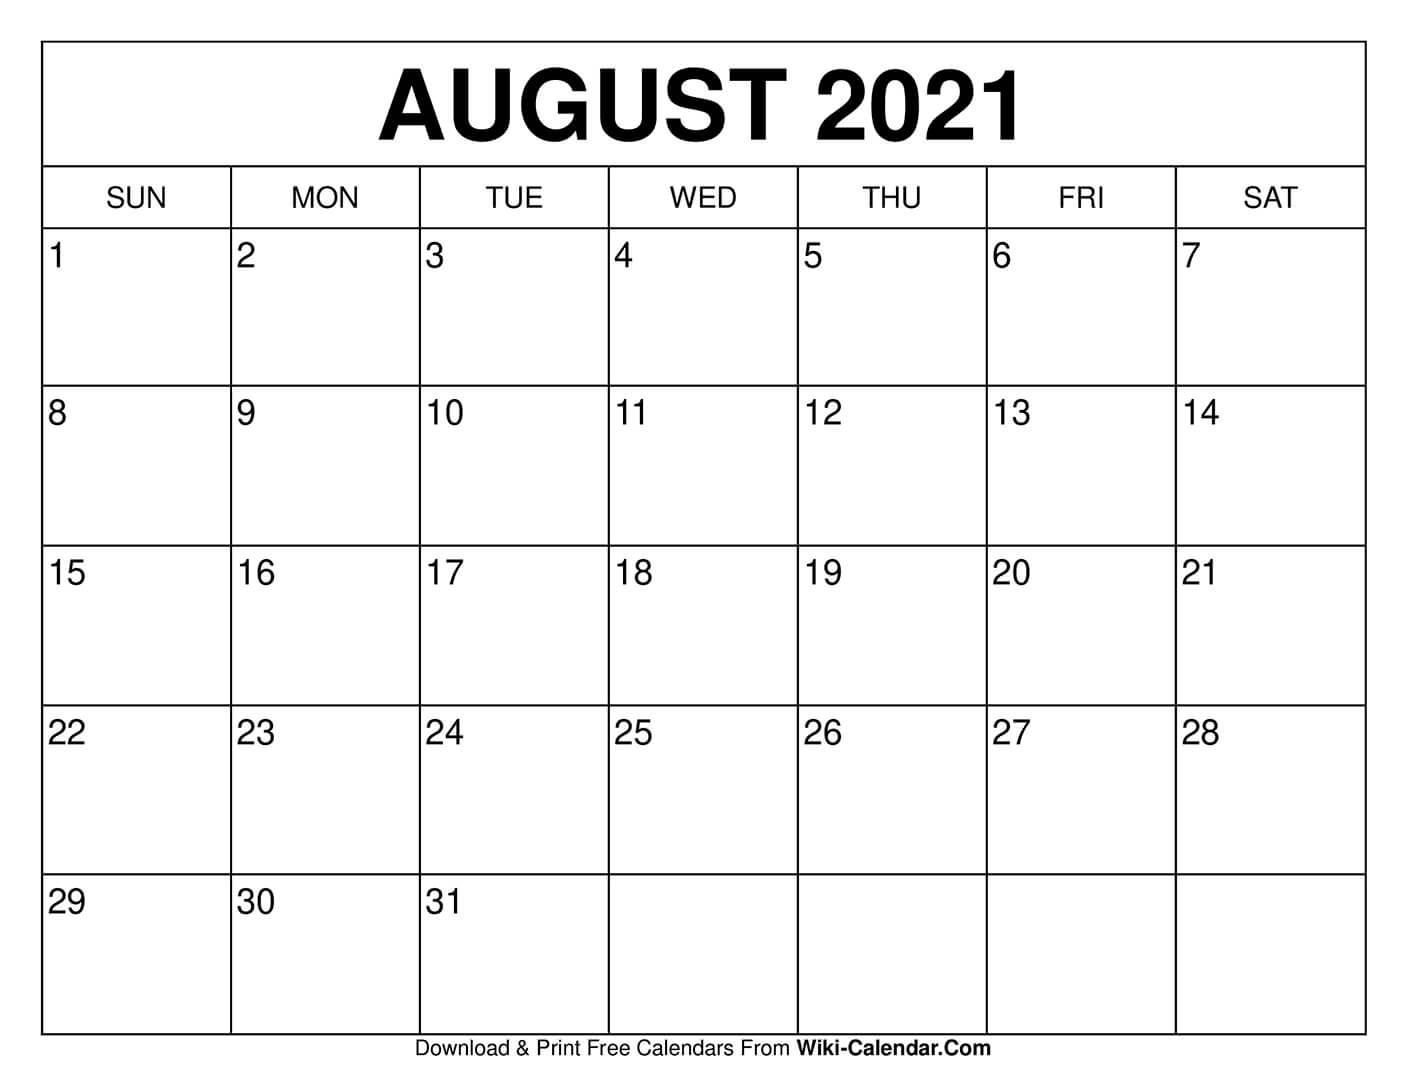 Free Printable August 2021 Calendars August 2021 Template Calendar